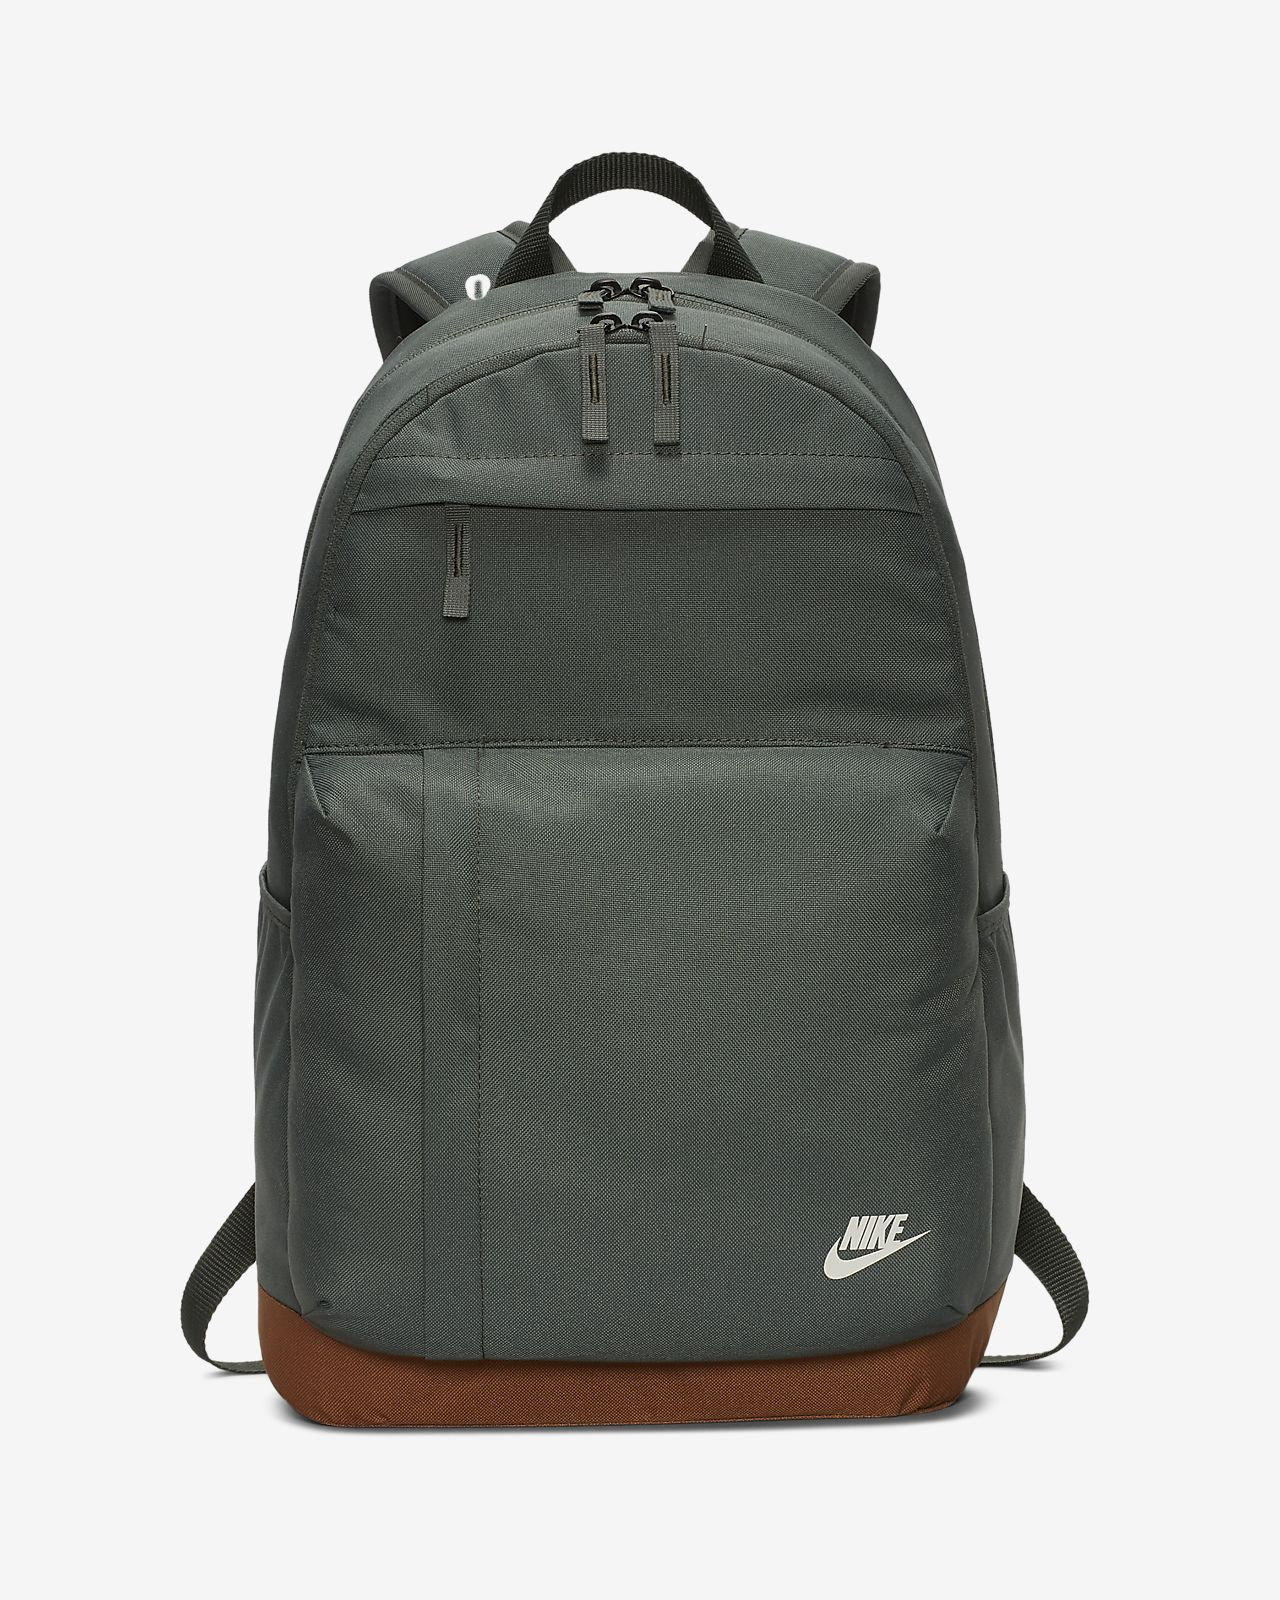 1f03e3e3da3 Nike Elemental Backpack. Nike.com AU